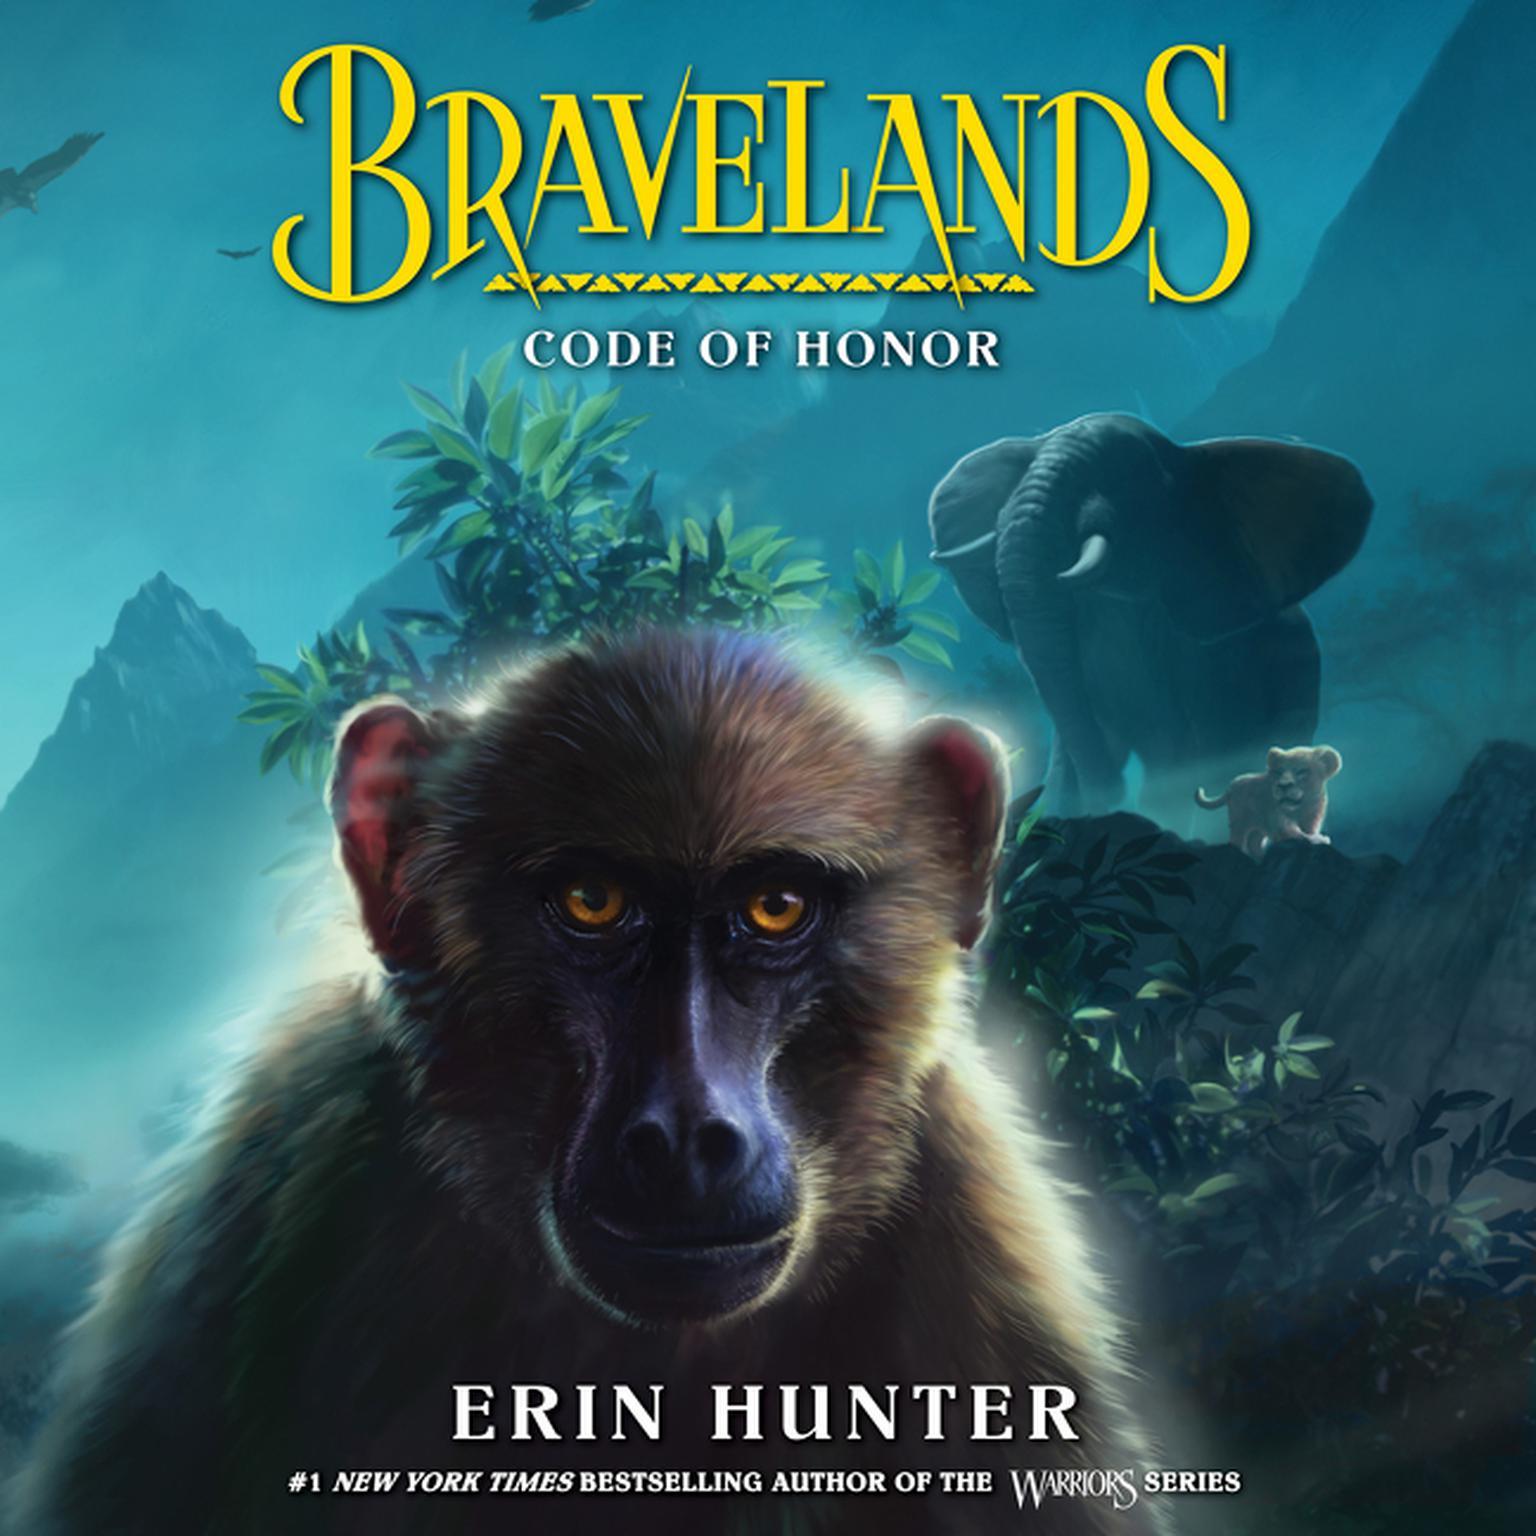 Bravelands #2: Code of Honor Audiobook, by Erin Hunter